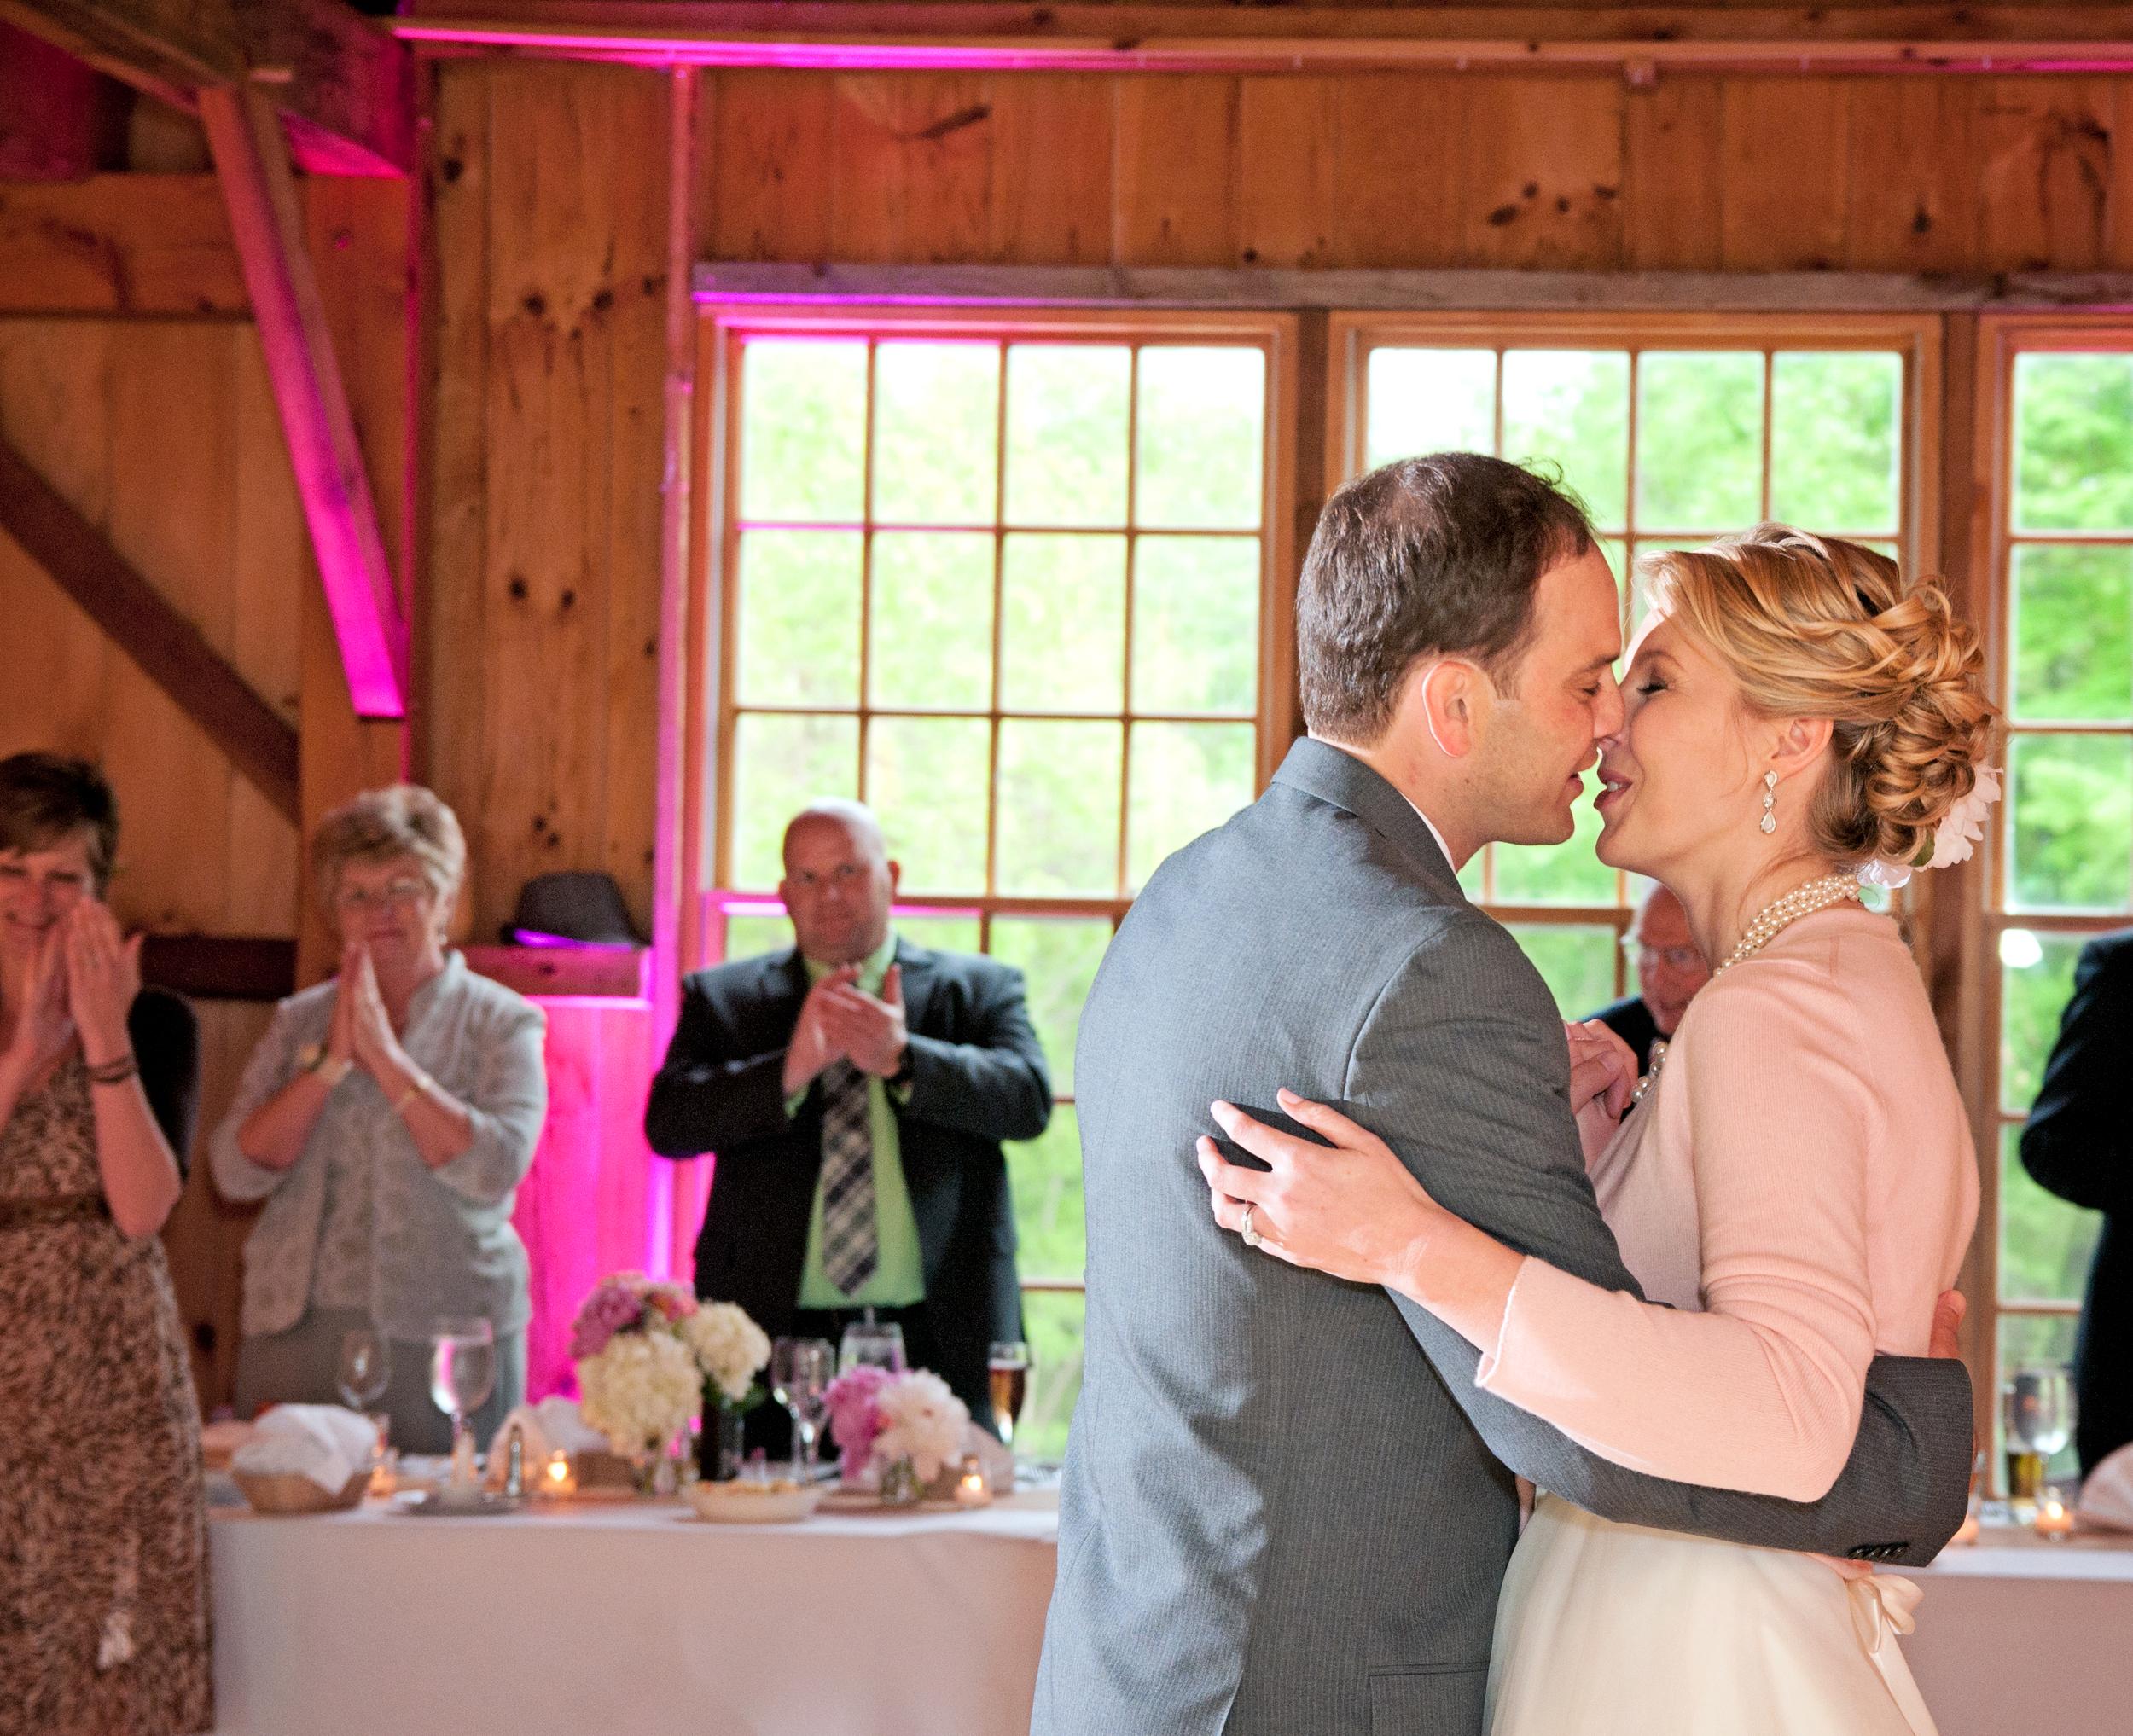 Angela_Chicoski_CT_wedding_photographer_061.jpg